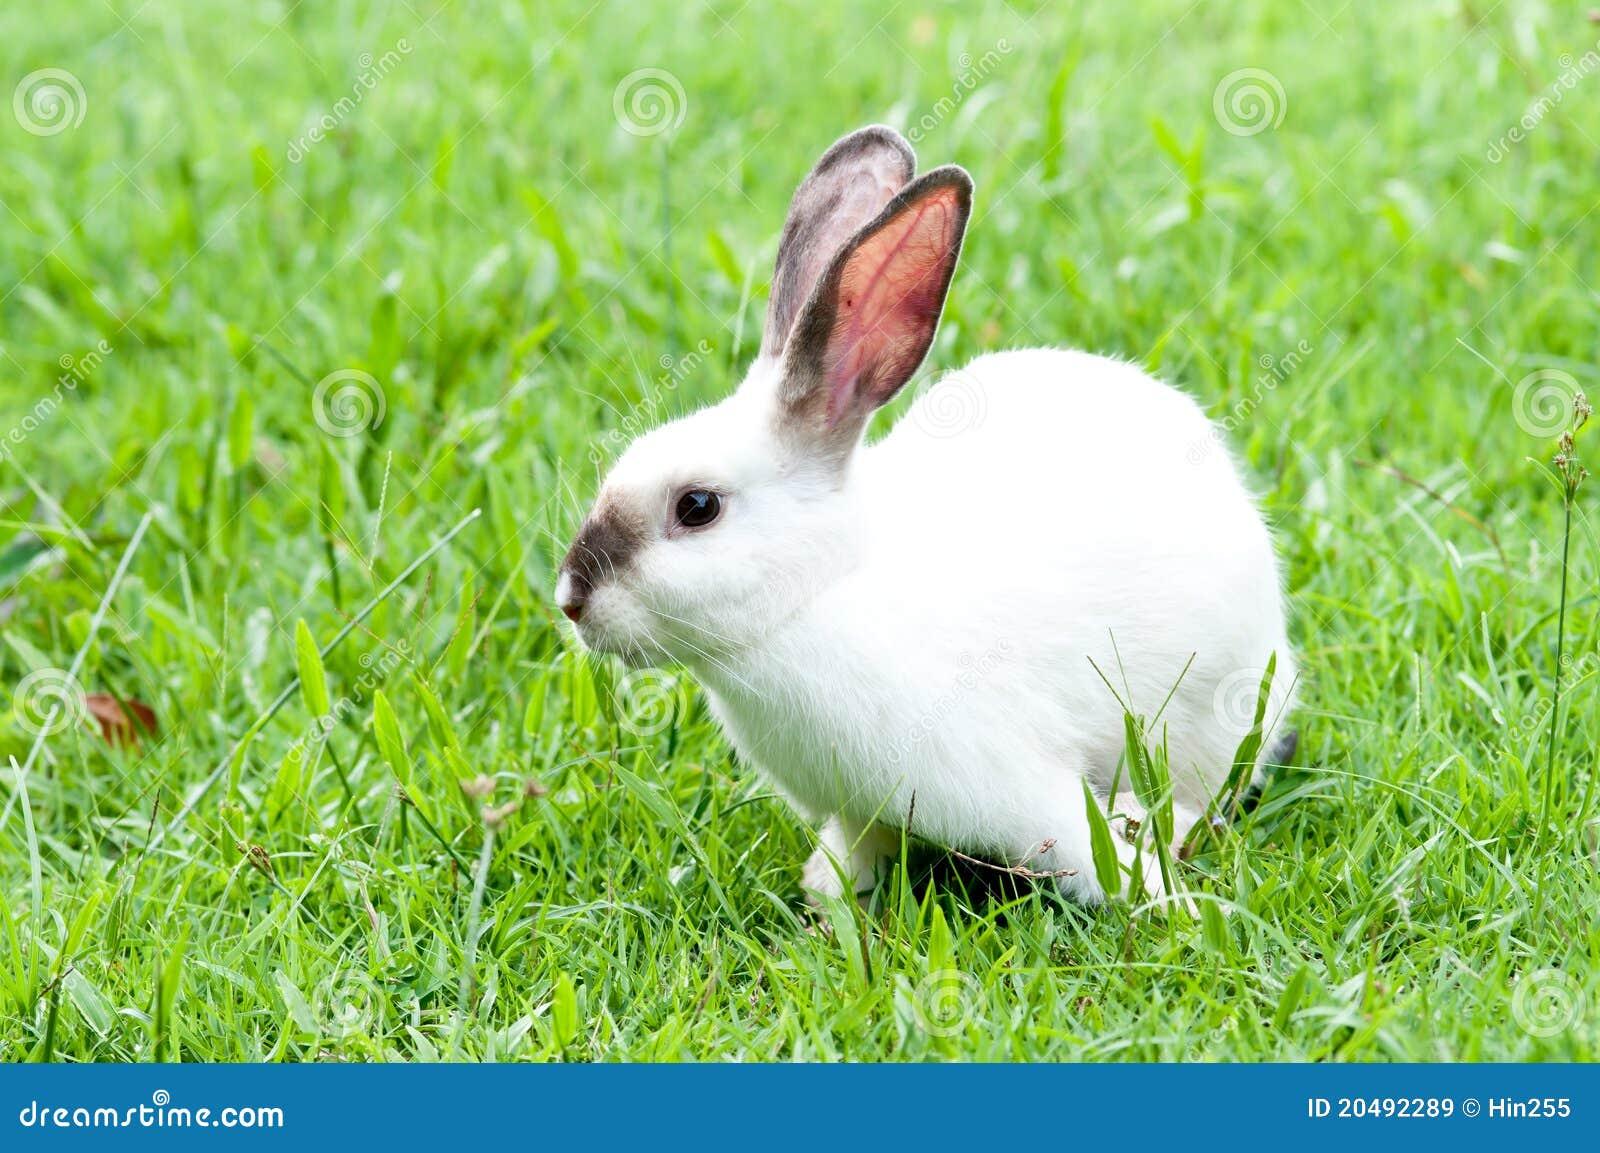 White Bunny On The Yard White Rabbit Royalty Free Stock ...